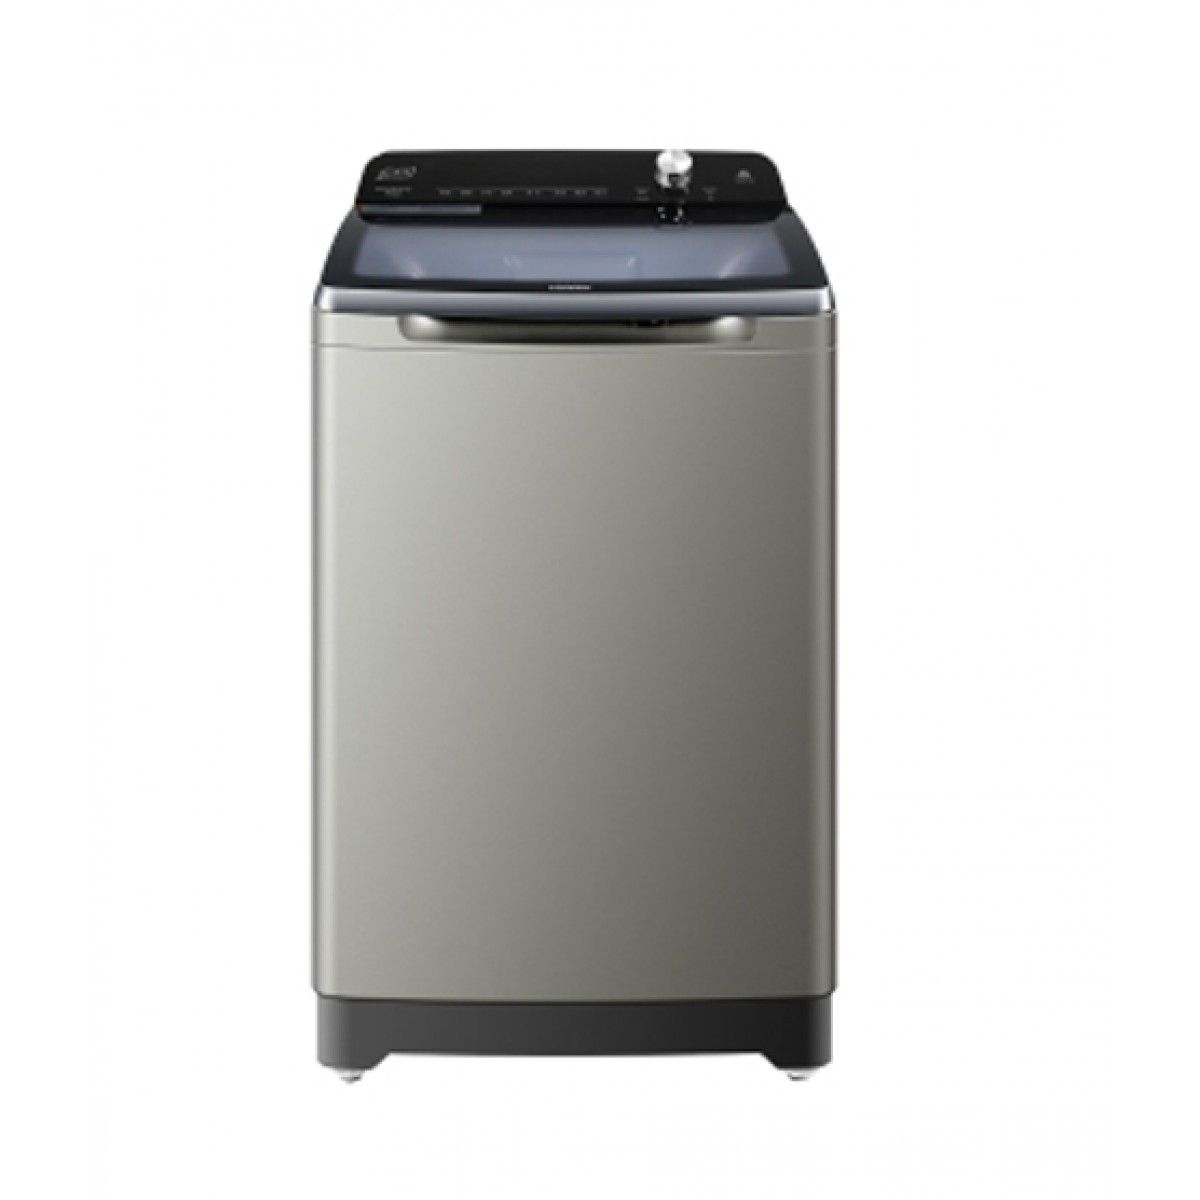 Haier HWM 200-1678(Automatic) Washing Machine